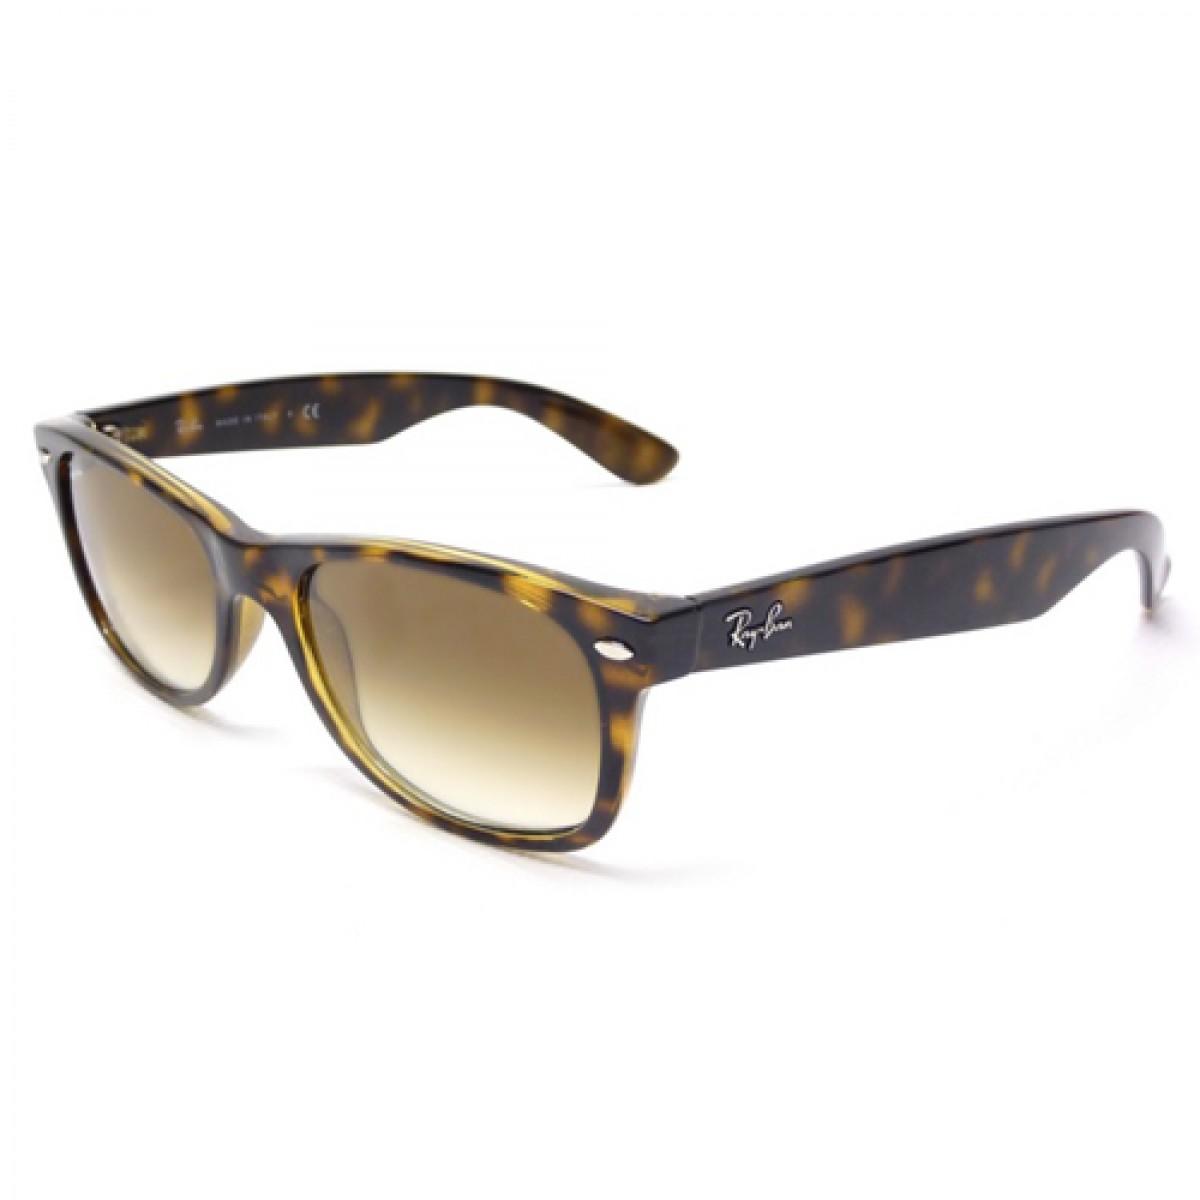 bec1406b7ec19 Ray Ban New Wayfarer Unisex Sunglasses RB2132-710 51 - Sunglasses - Fashion  World